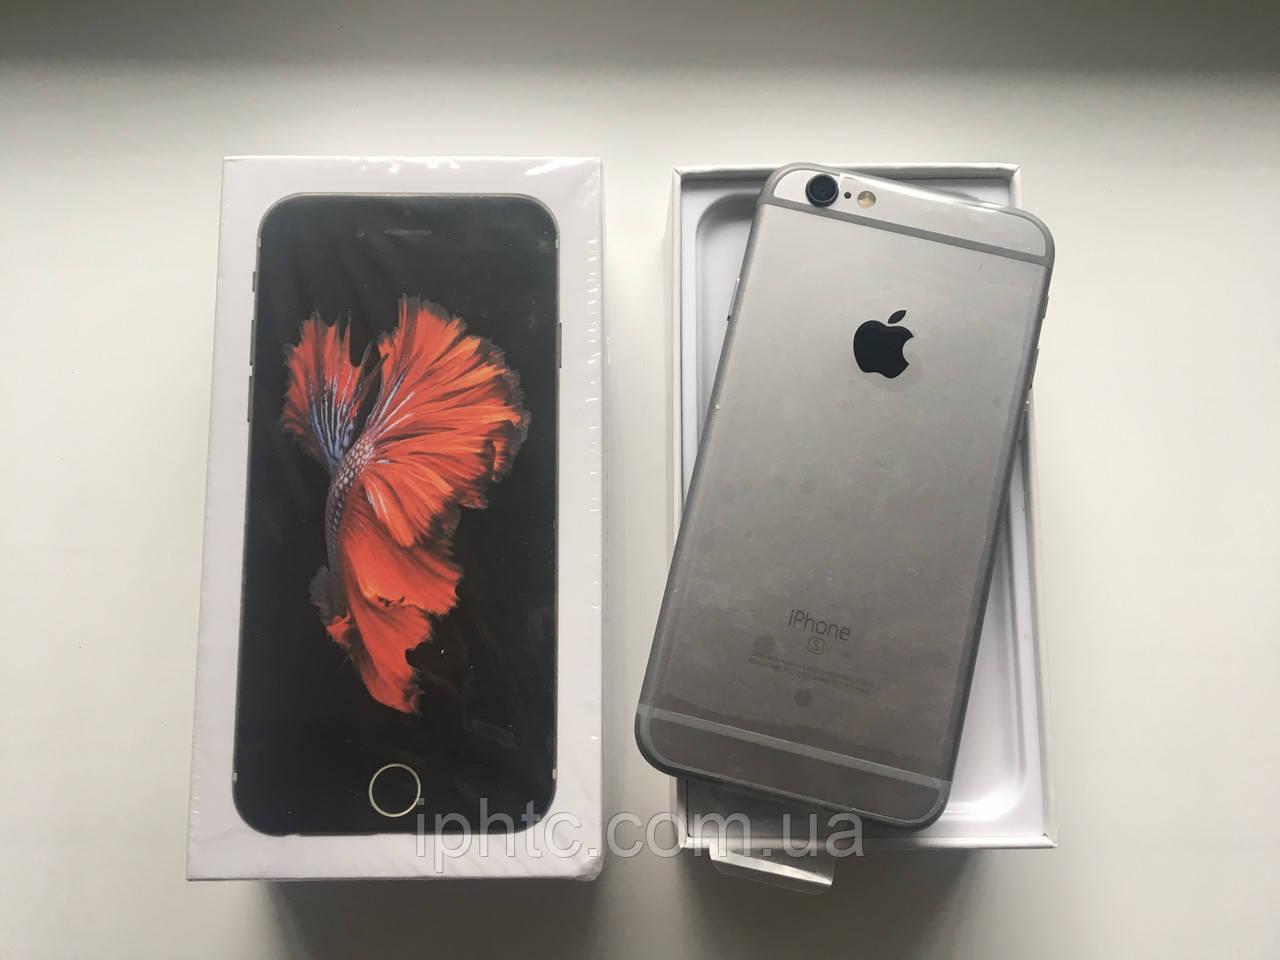 Apple iPhone 6S 64GB Grey /Новый / NeverLock Запечатан